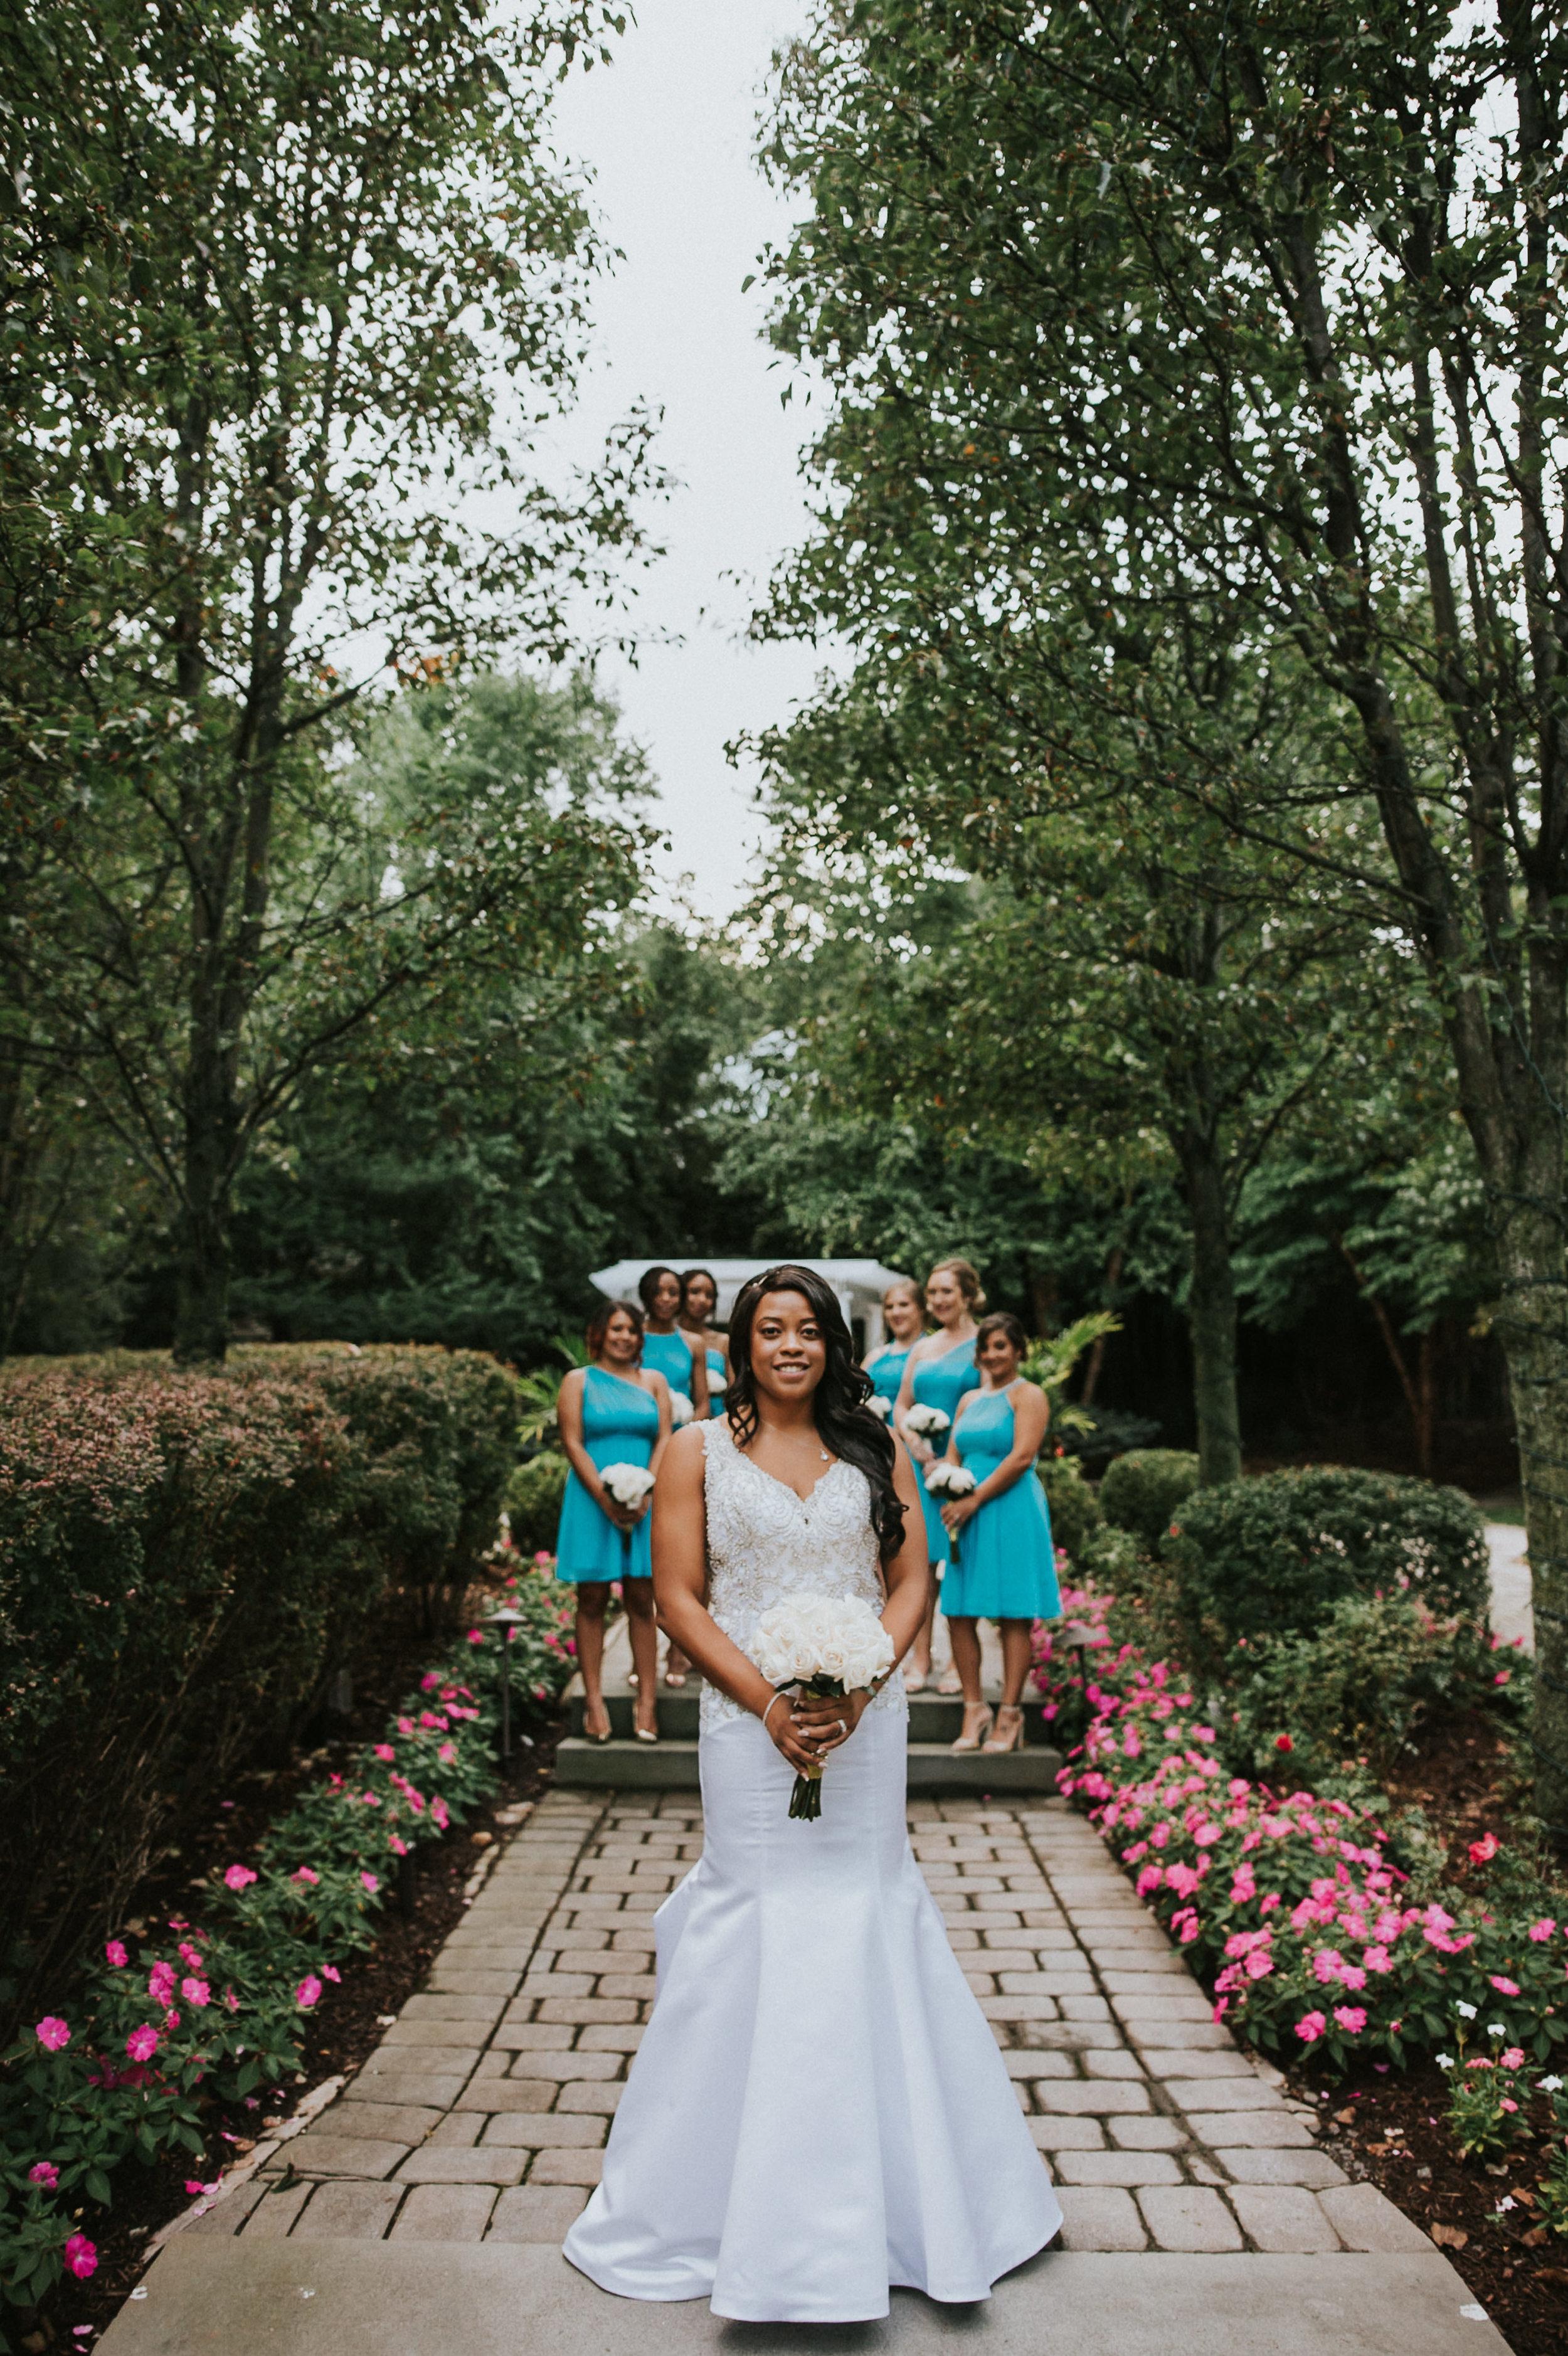 Tiana-and-Danny-Wedding-641.jpg